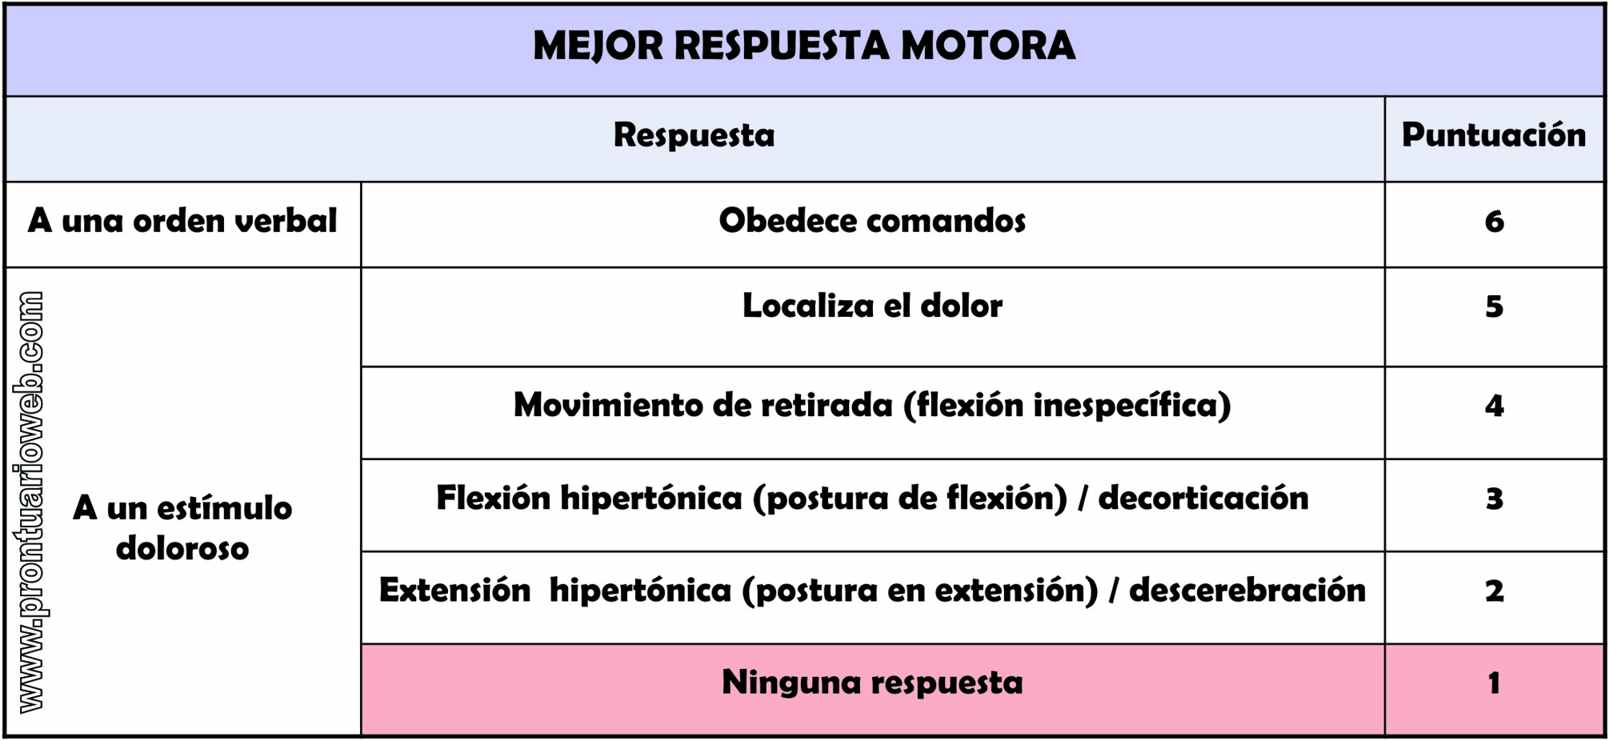 respuesta motora español - prontuarioweb